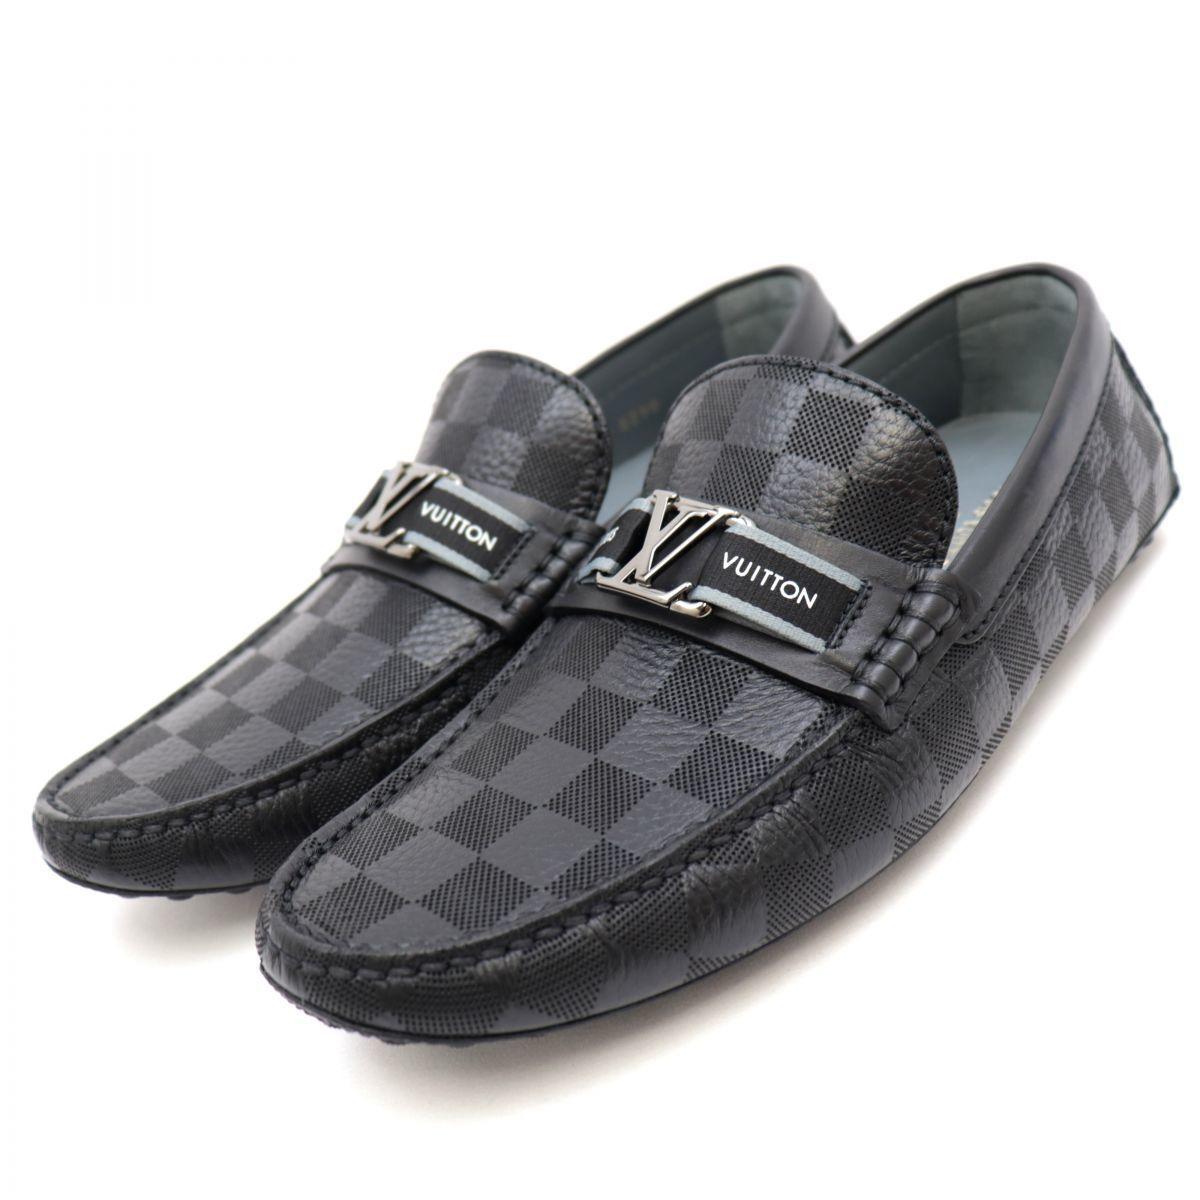 Louis Vuitton 21SS Hockenheimring Driving Shoes Men's Black 5 Damier Loafers LV hardware